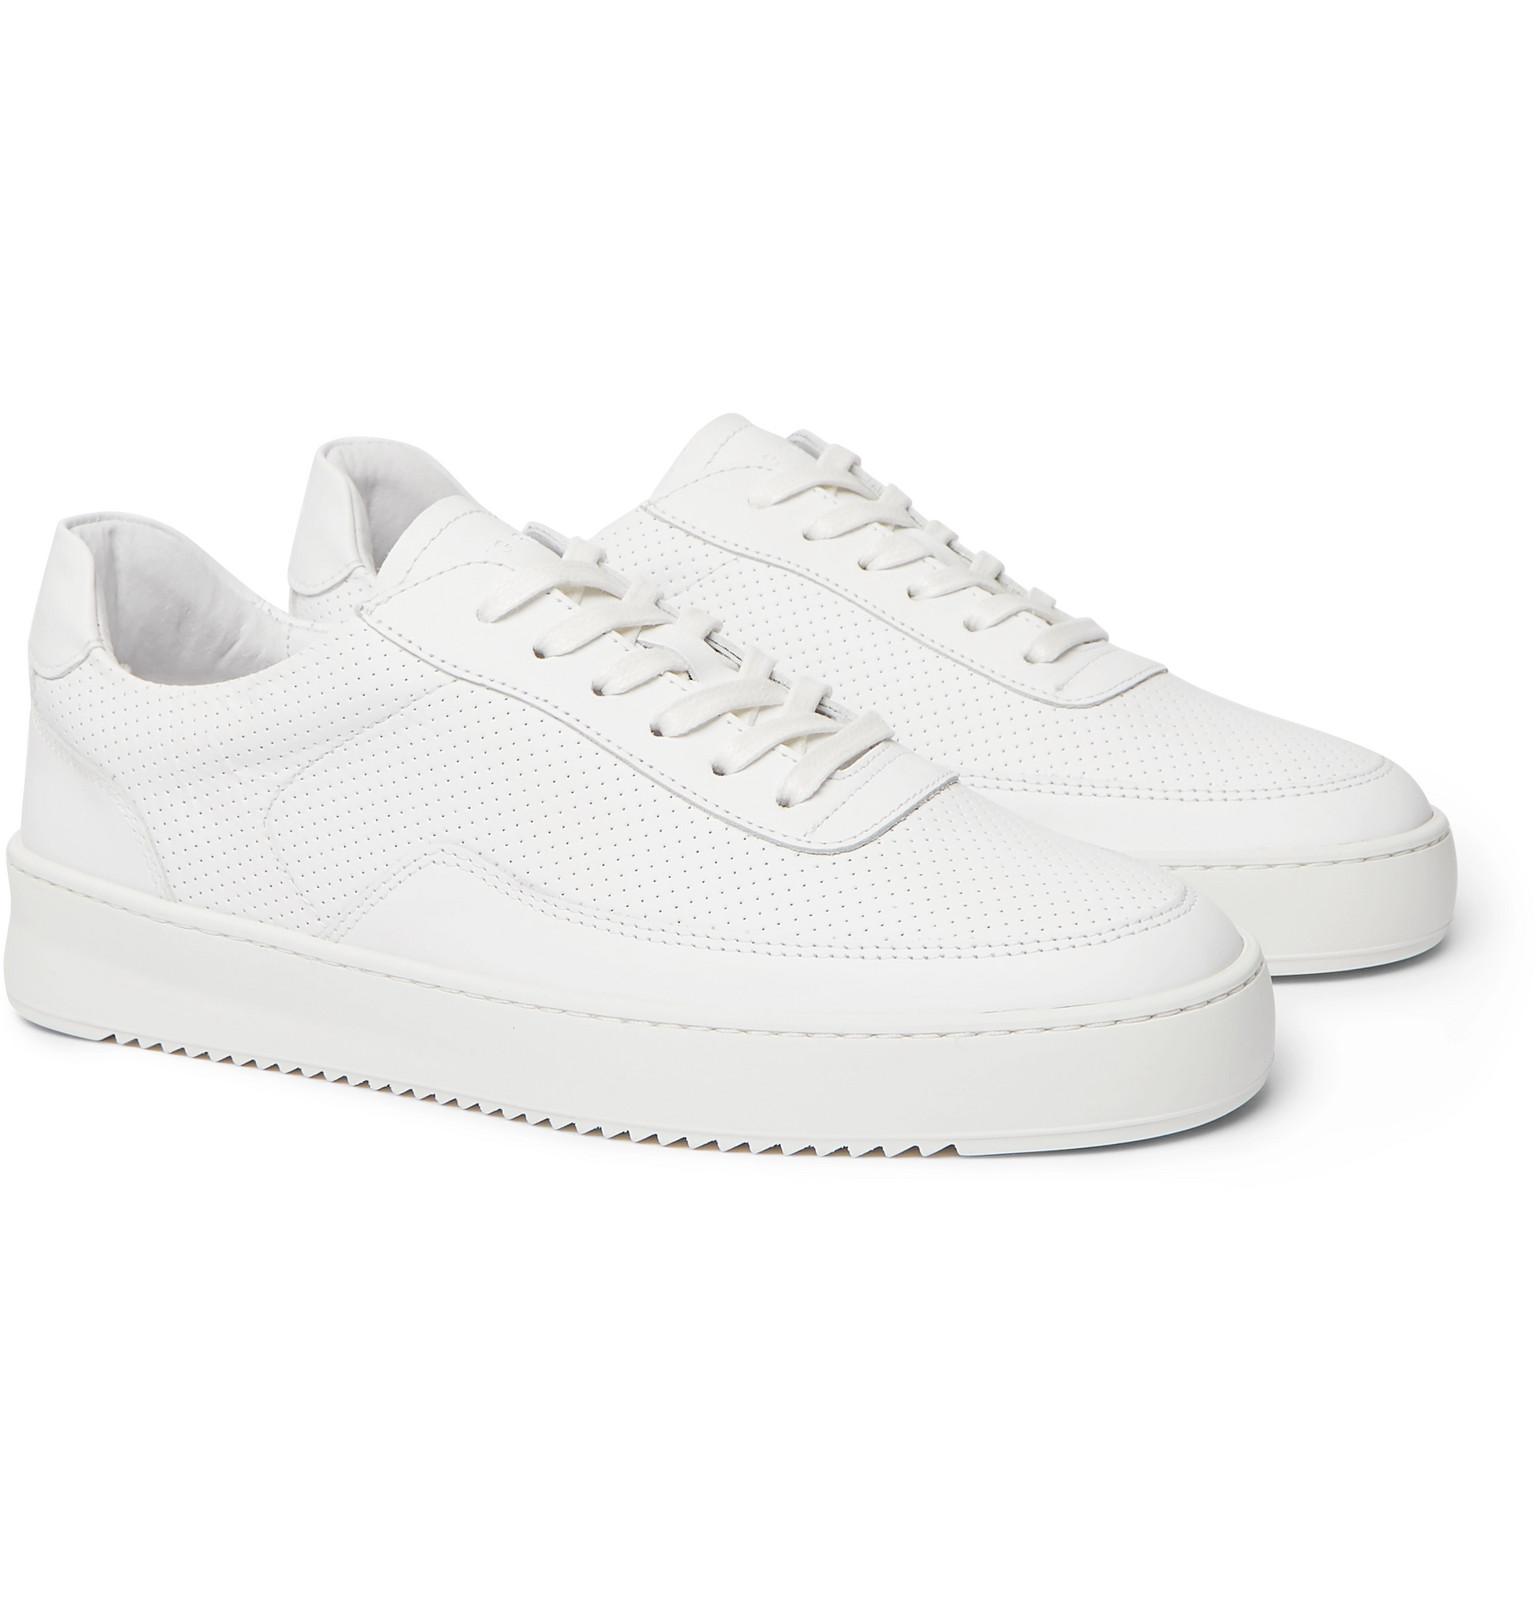 Die besten weißen Sneaker 2020: Filling Pieces white sneakers